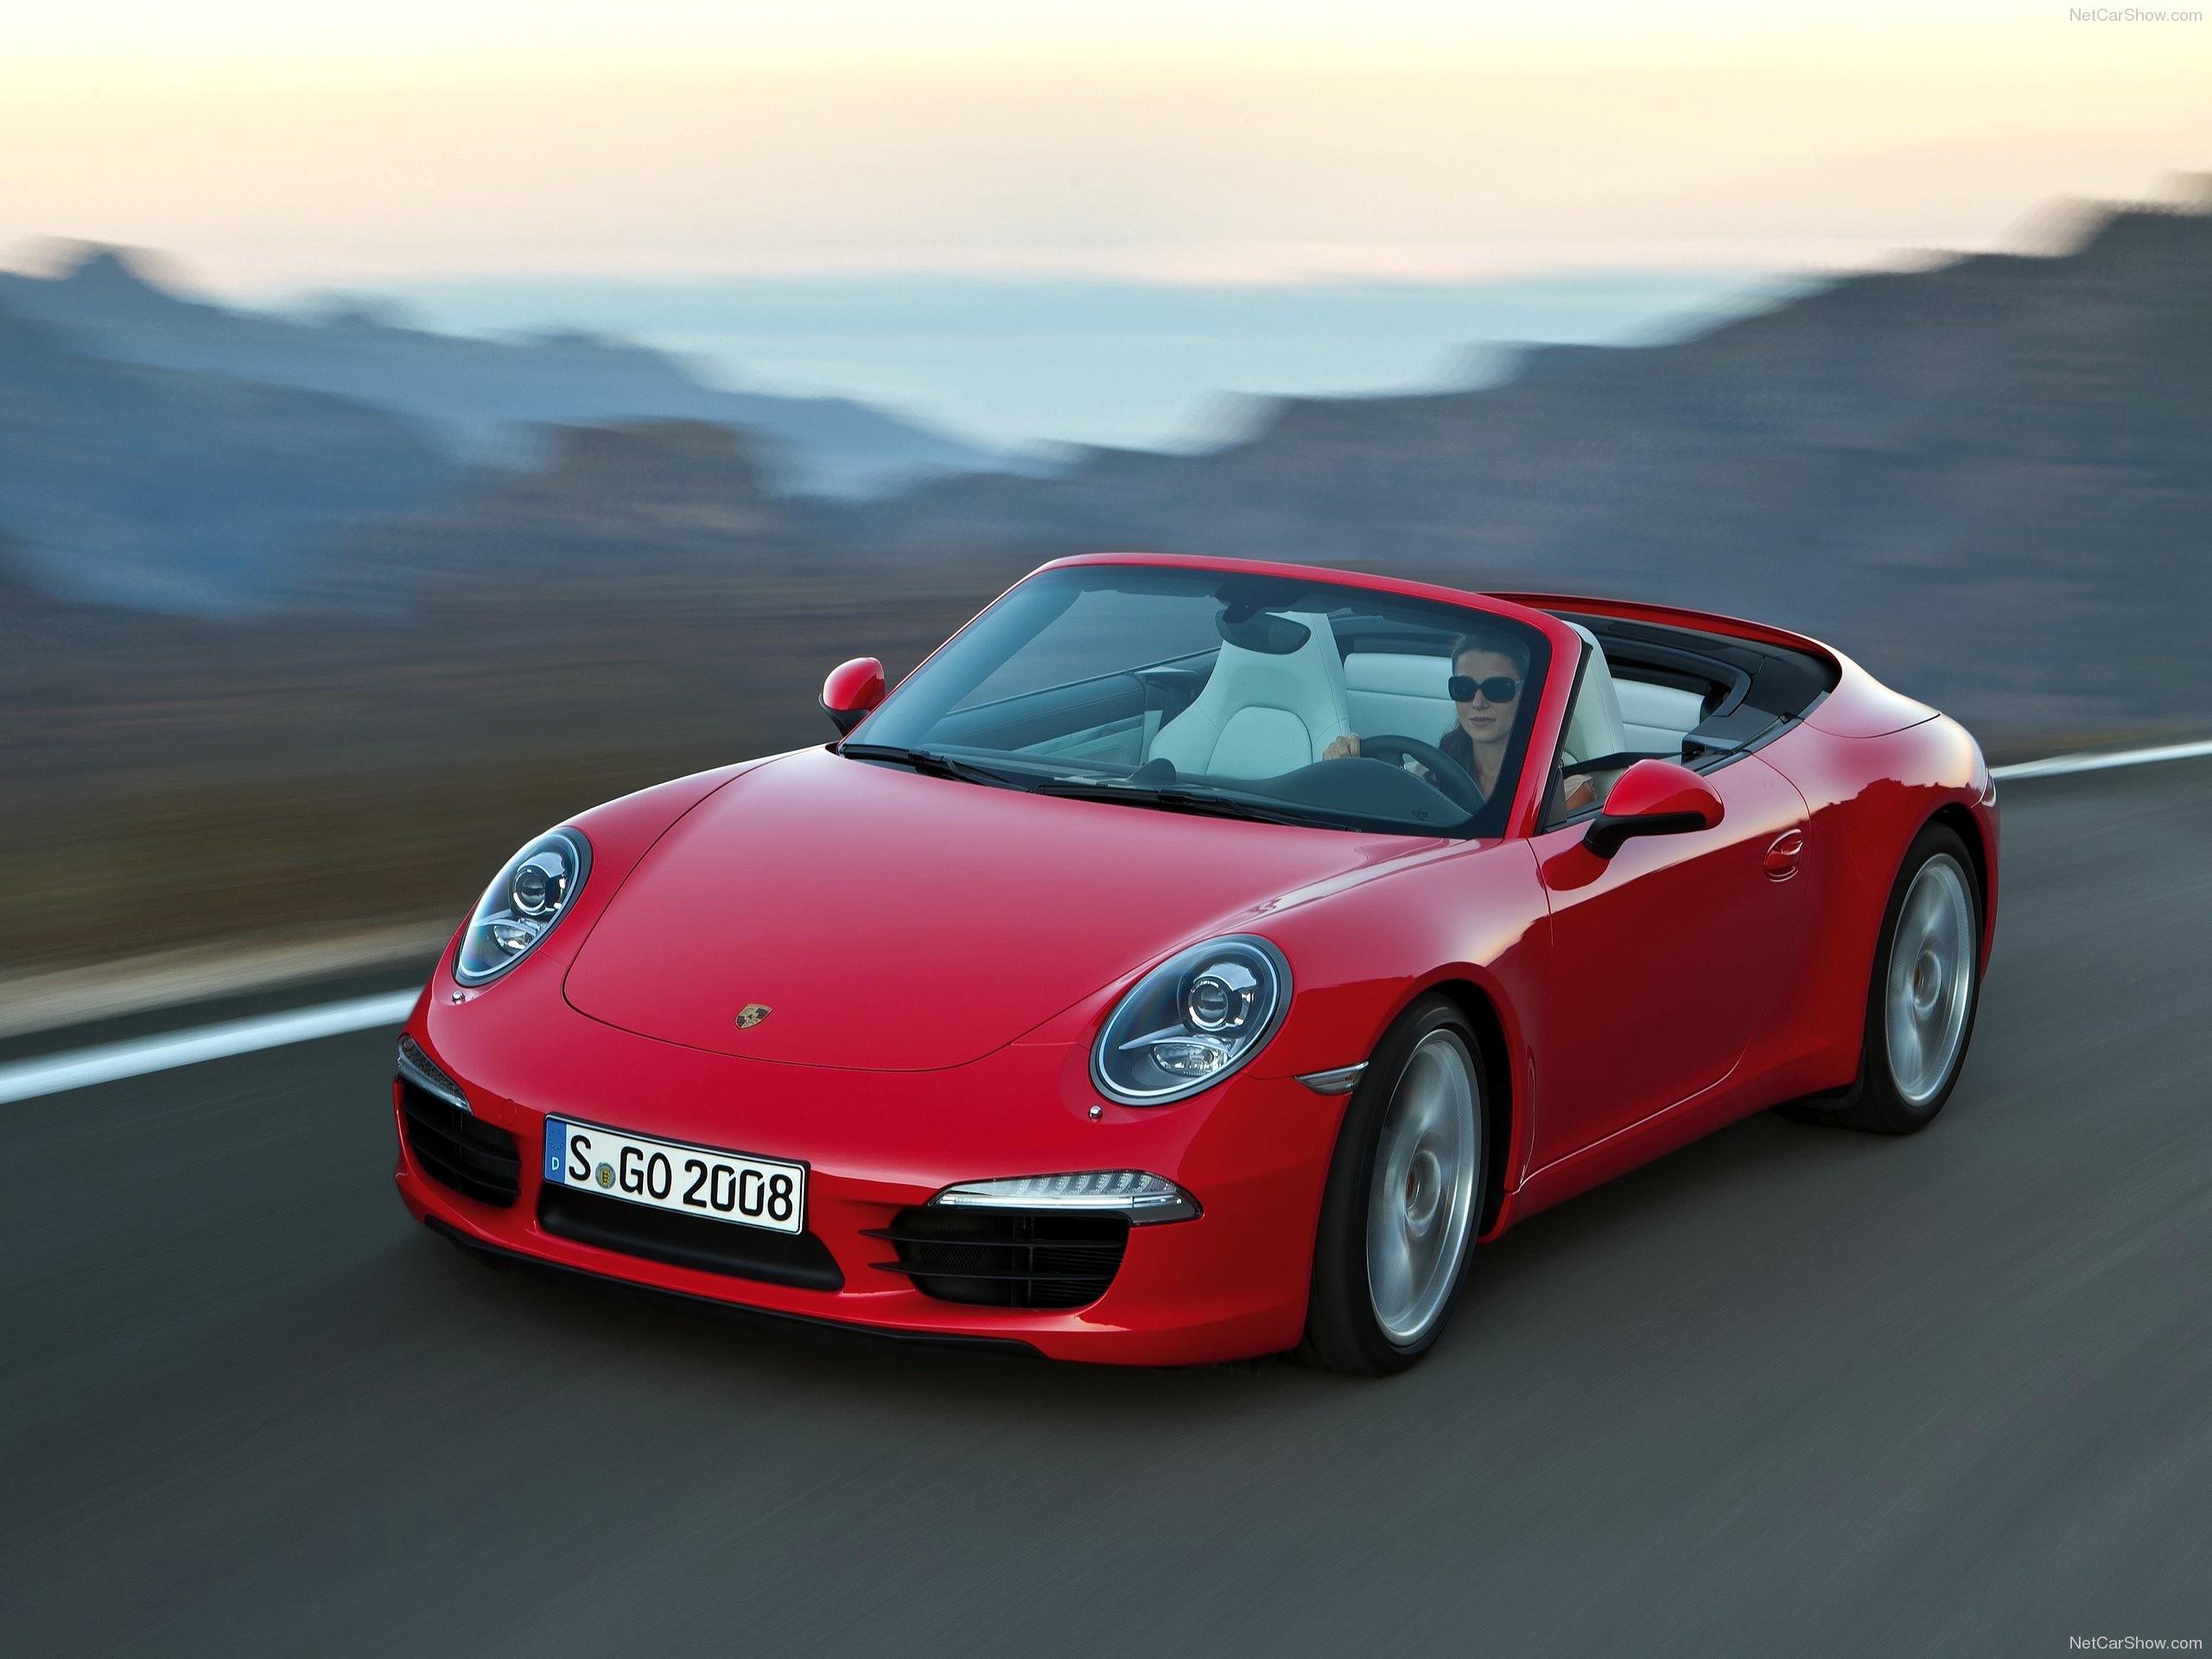 Porsche 911 Carrera wallpapers HD quality